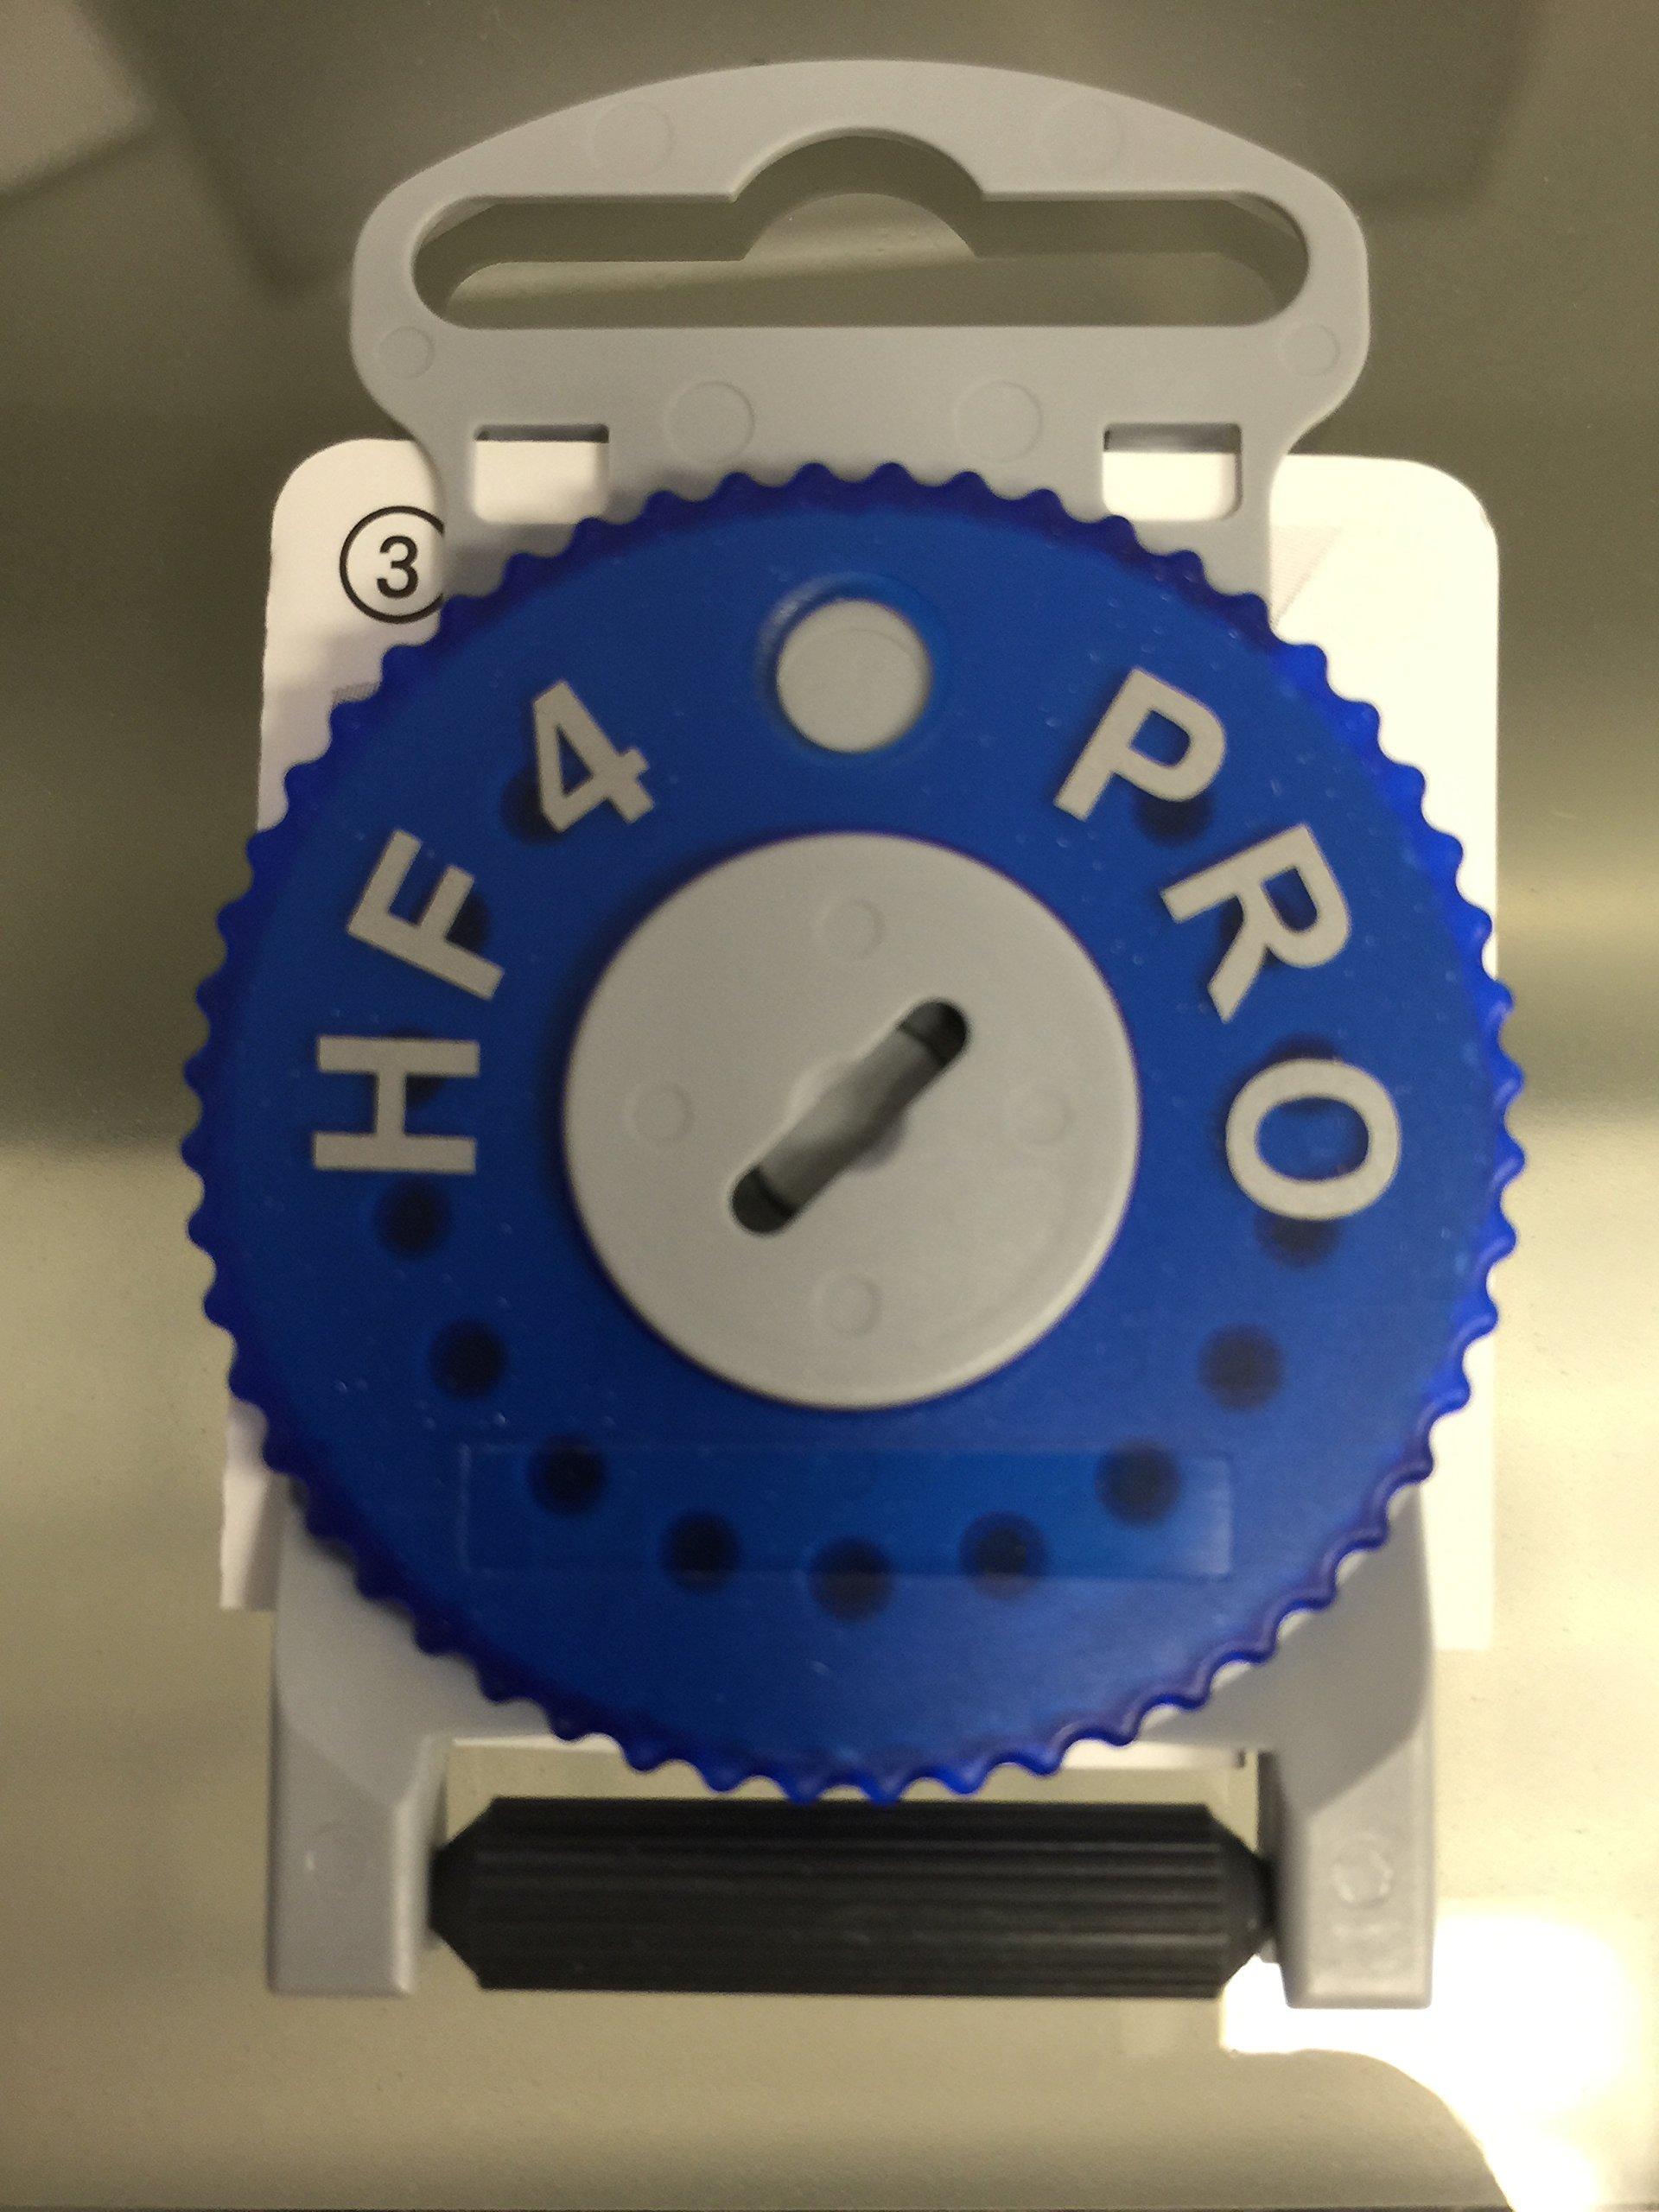 Siemens HF4 PRO Wax Filter, Blue for Left Ear